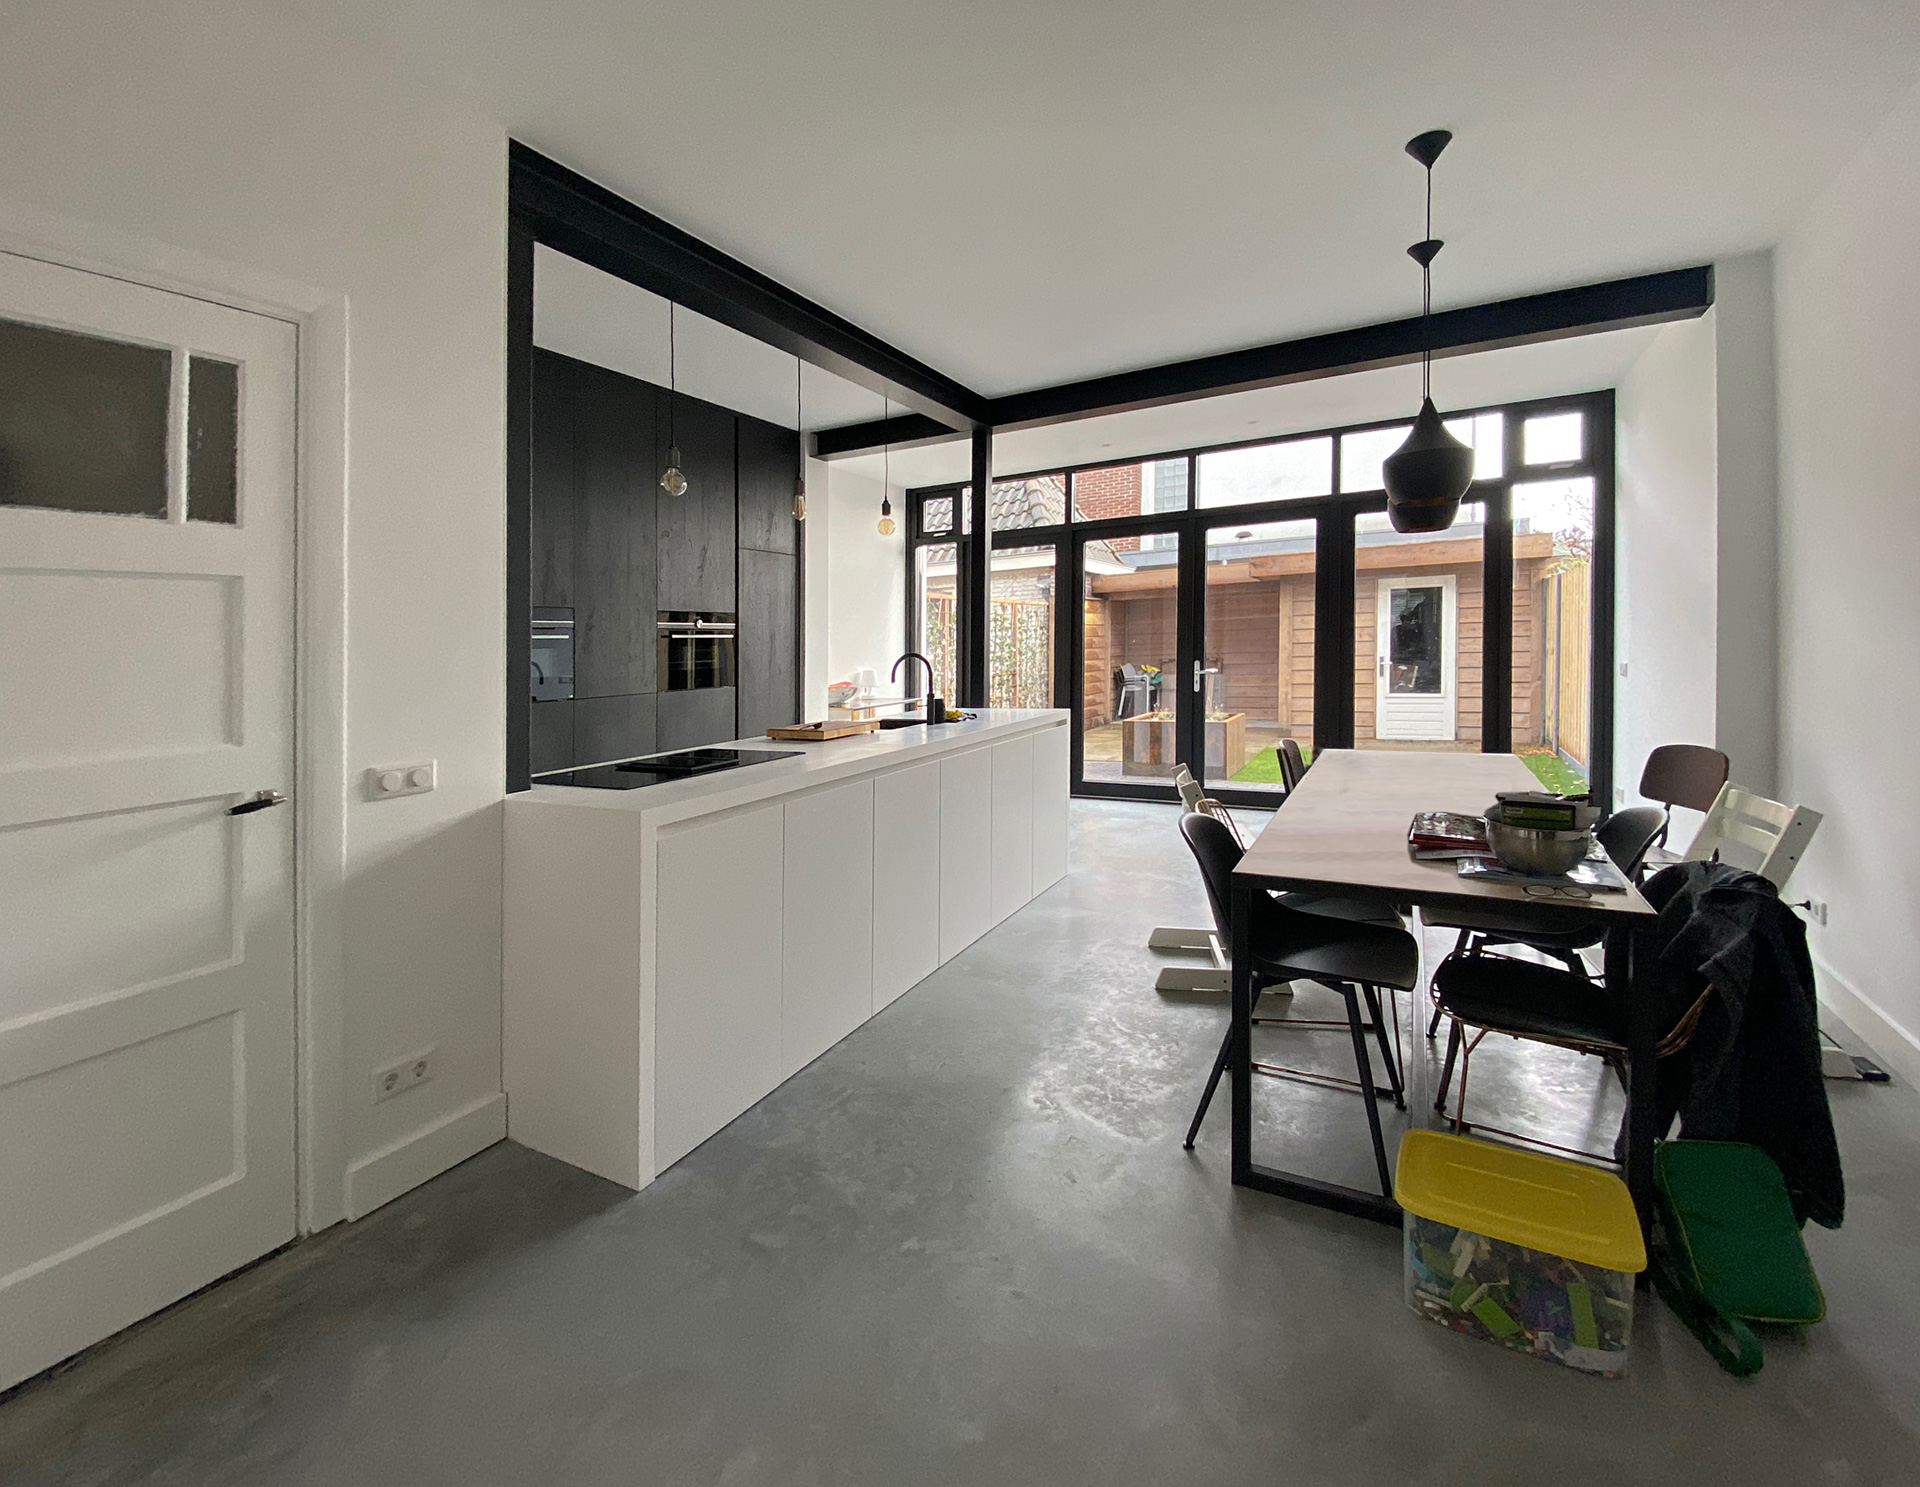 aanbouw-stalen-balken-zwart-ID-Architectuur-3